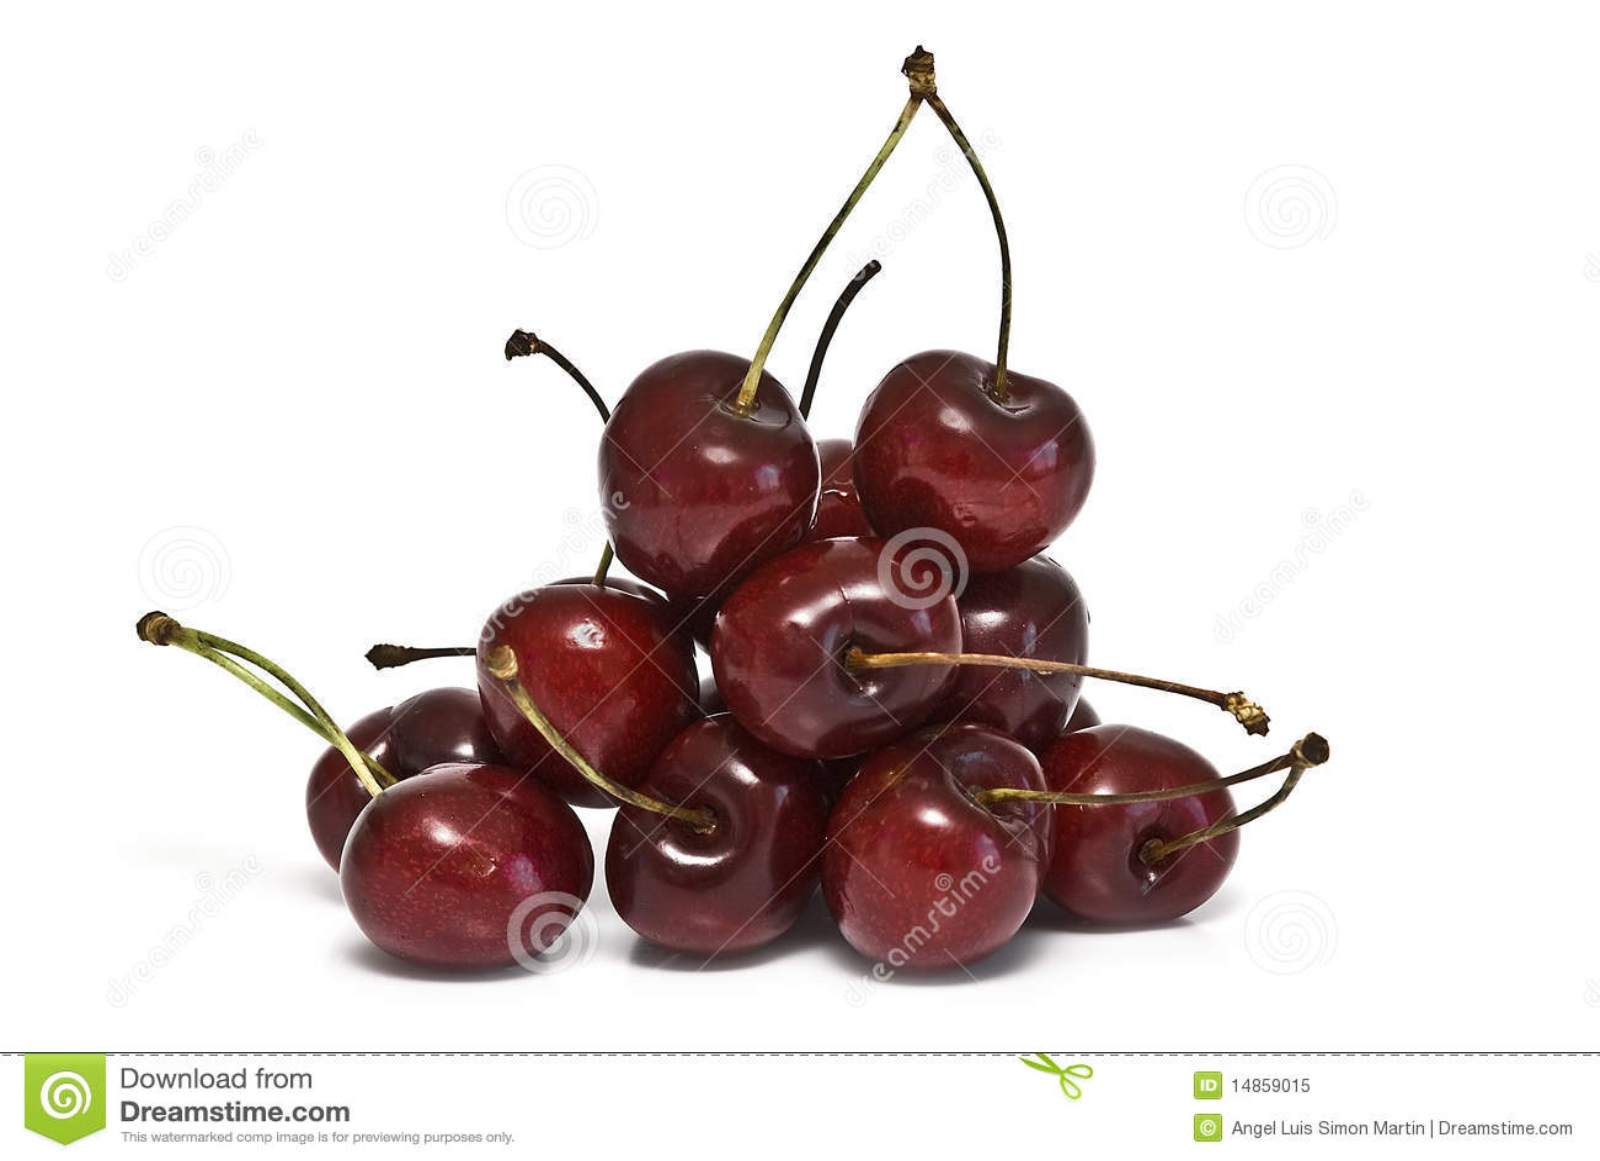 A lot of cherries.